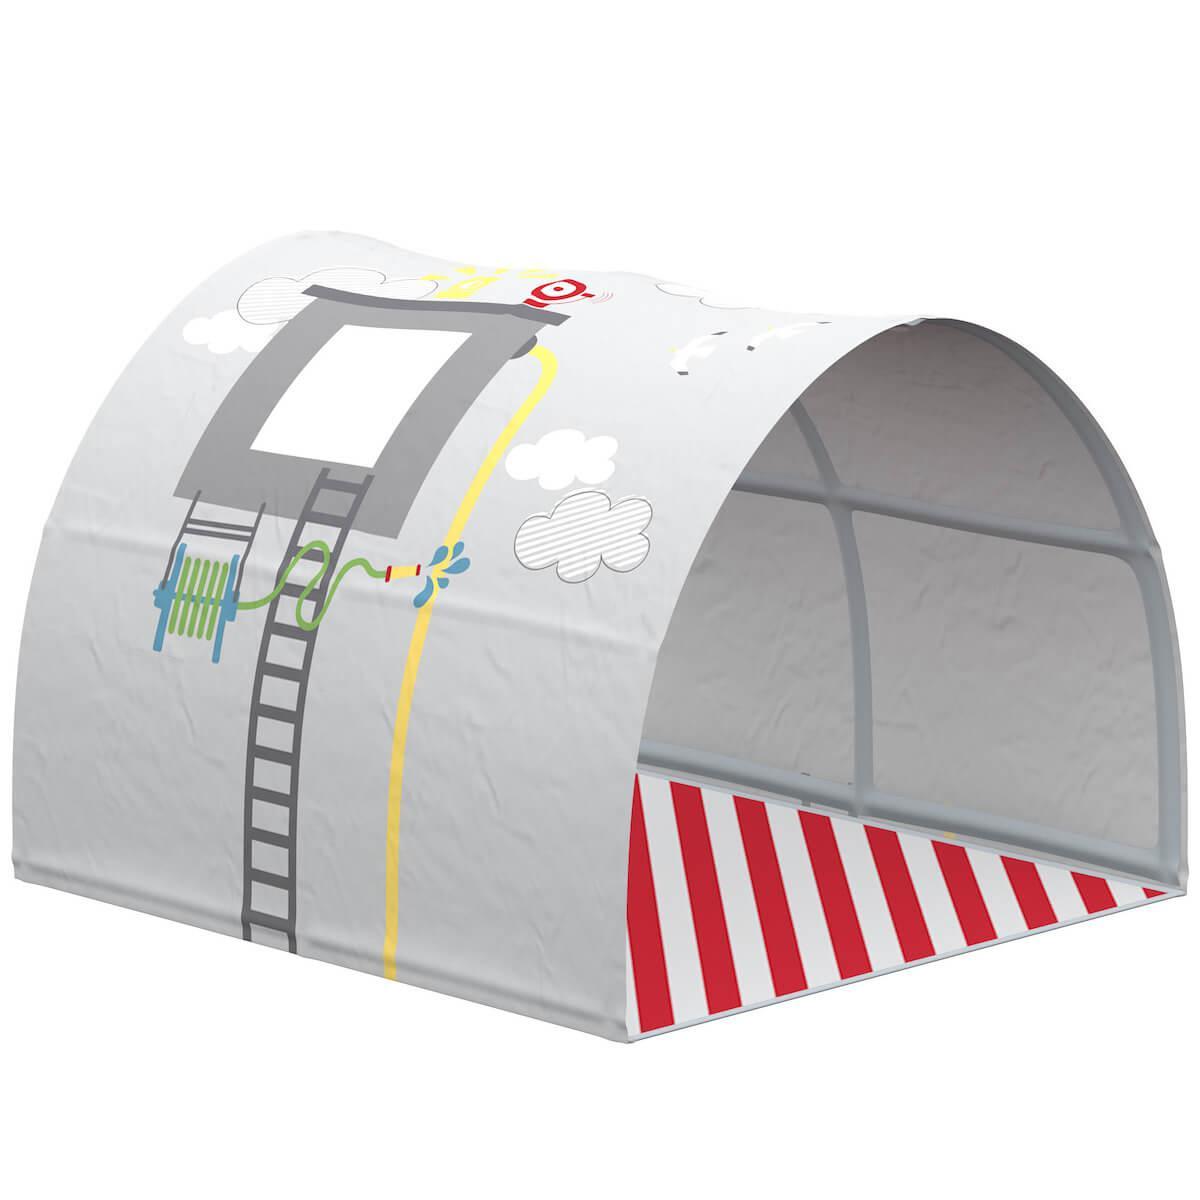 Cabane tunnel jeu PETITS HEROS Flexa